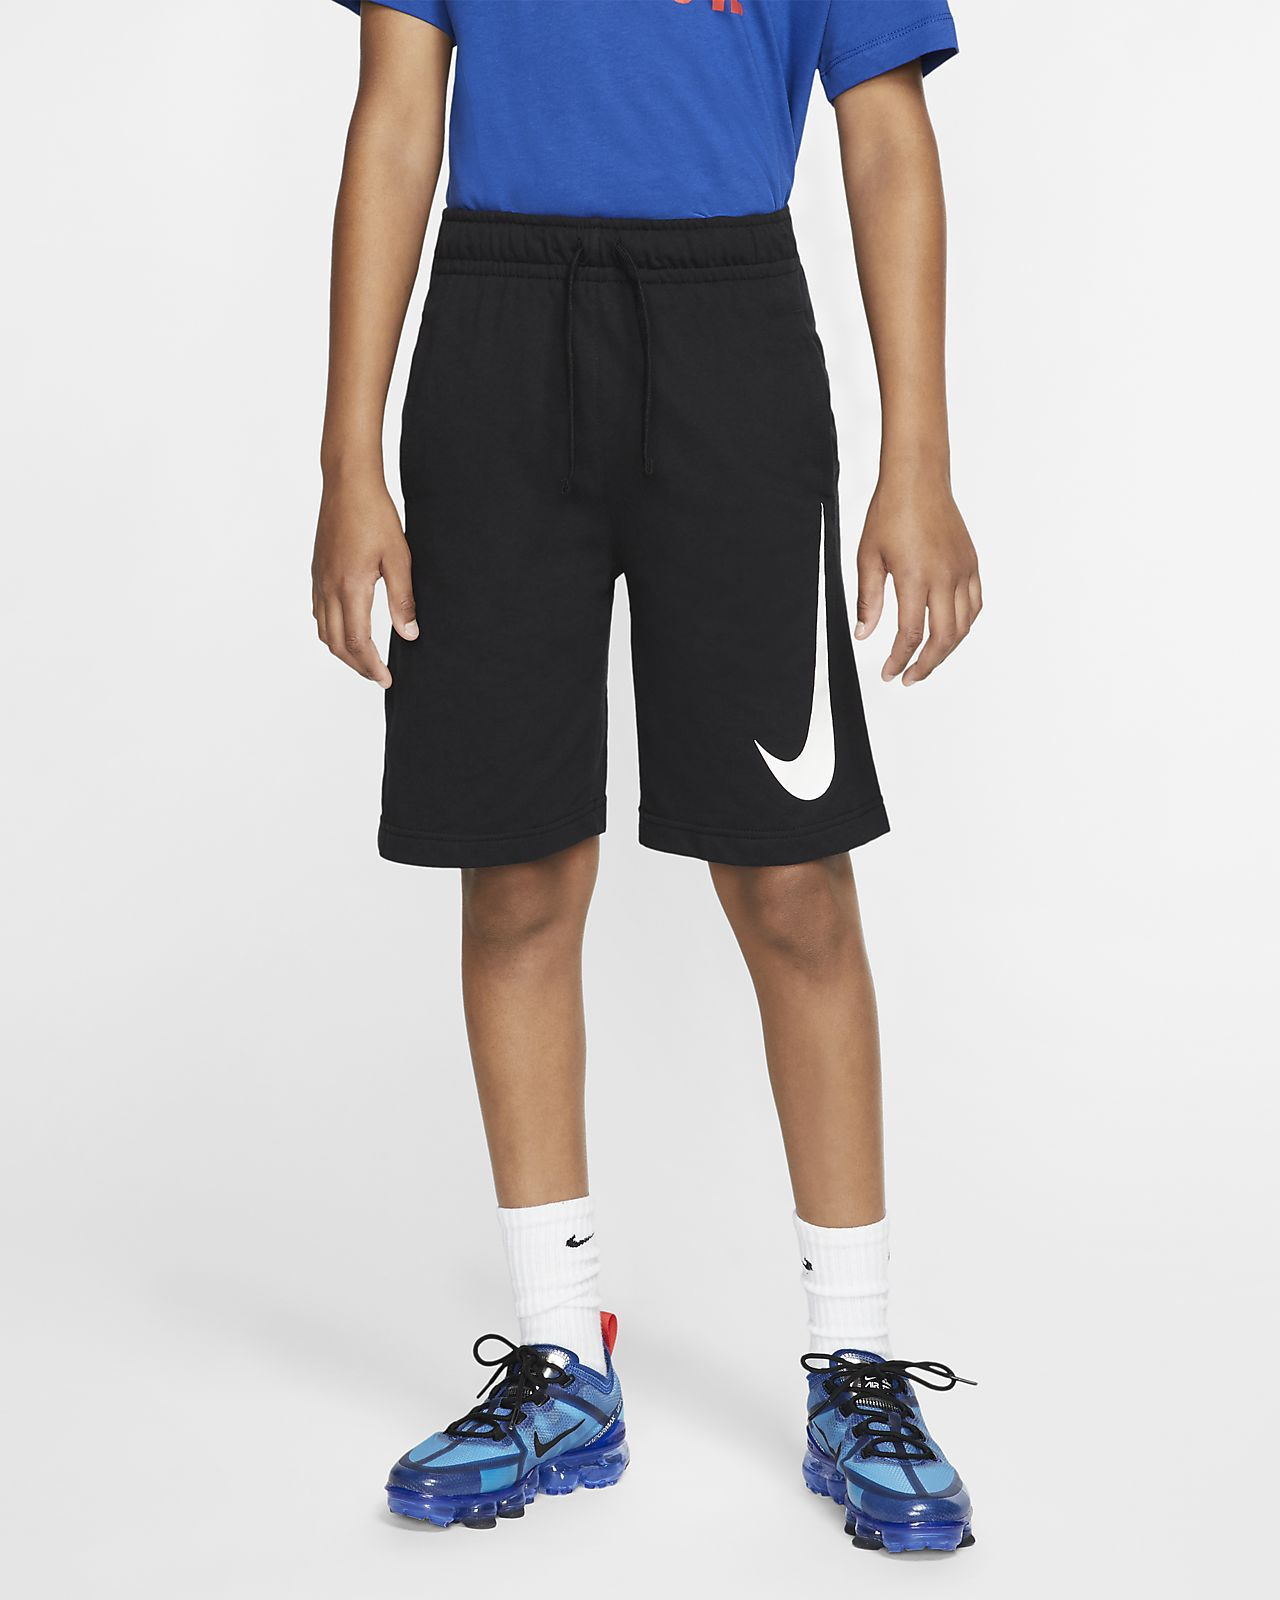 Nike Sportswear Pantalón corto de tejido French terry - Niño